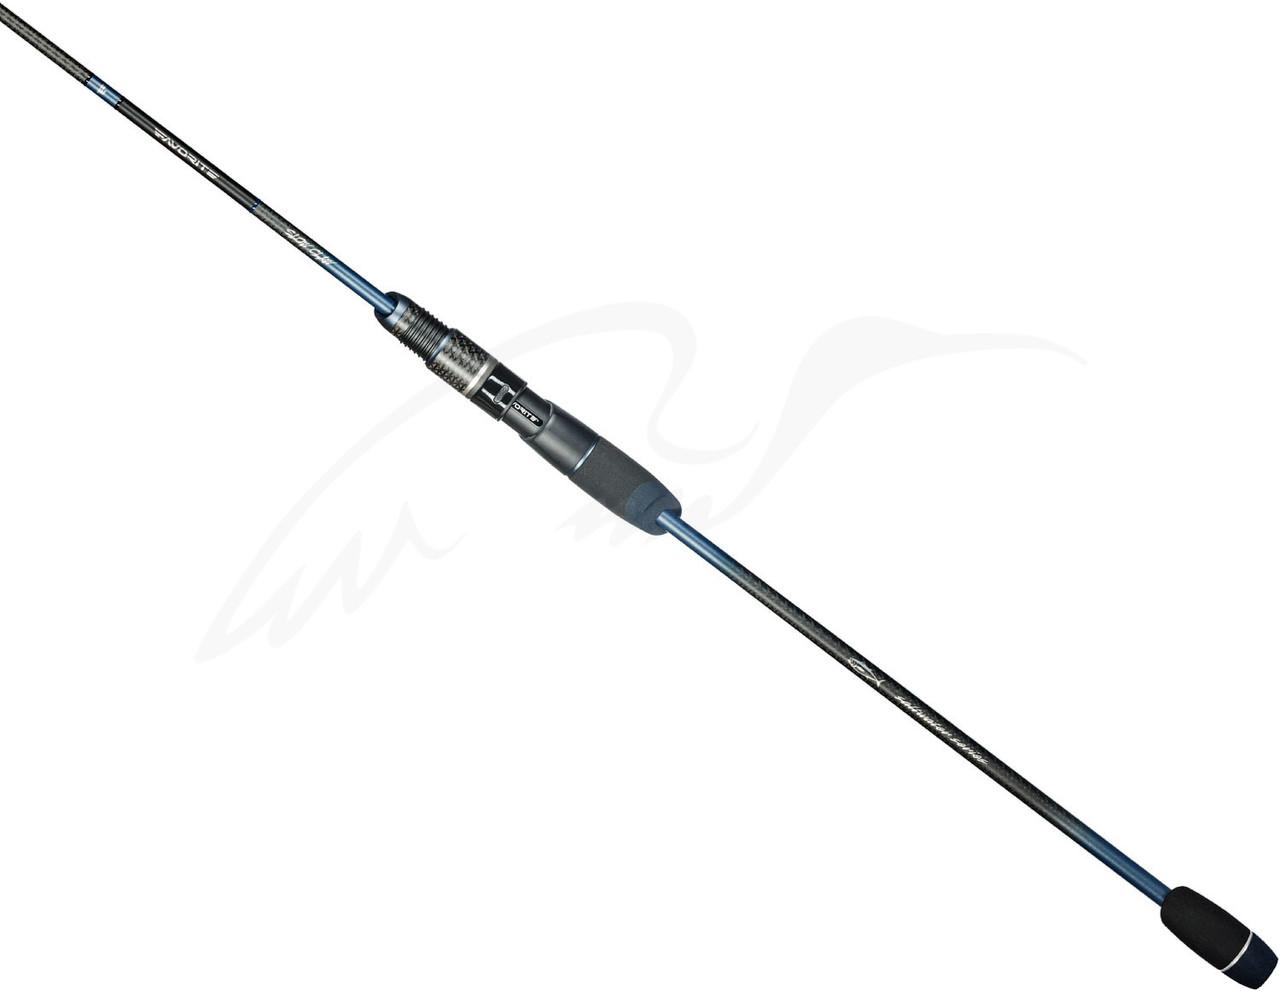 Спиннинг Favorite SW Slow Claw SLC-661ML 2.02m Jig 30-100g Power Class 1